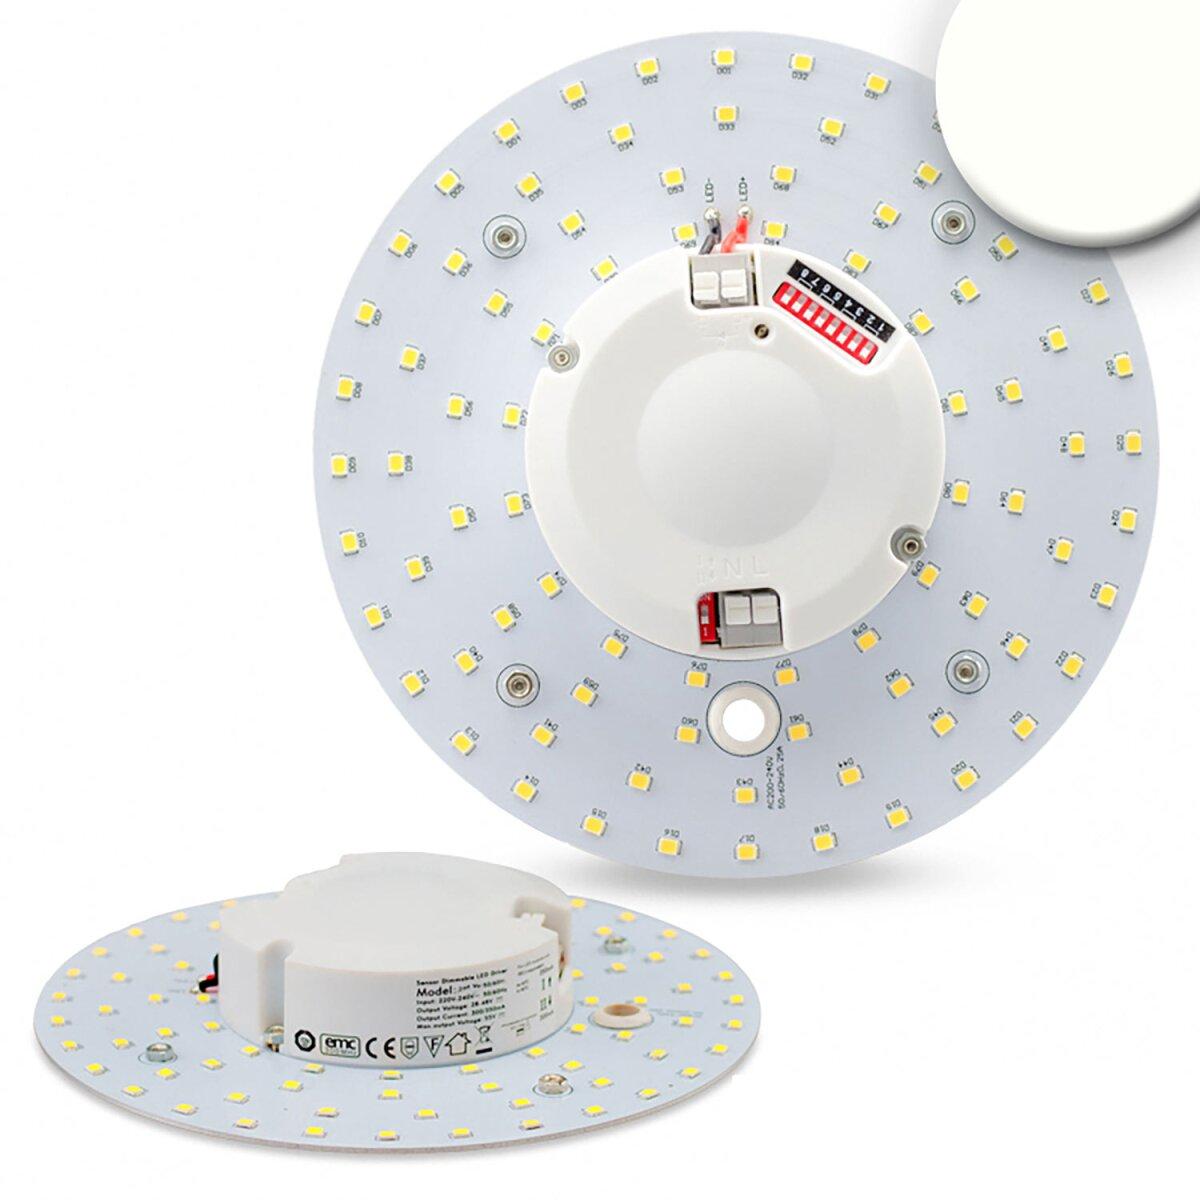 LED Umrüstplatine Radarsensor 160mm, 14W, mit Magnet, neutralwei